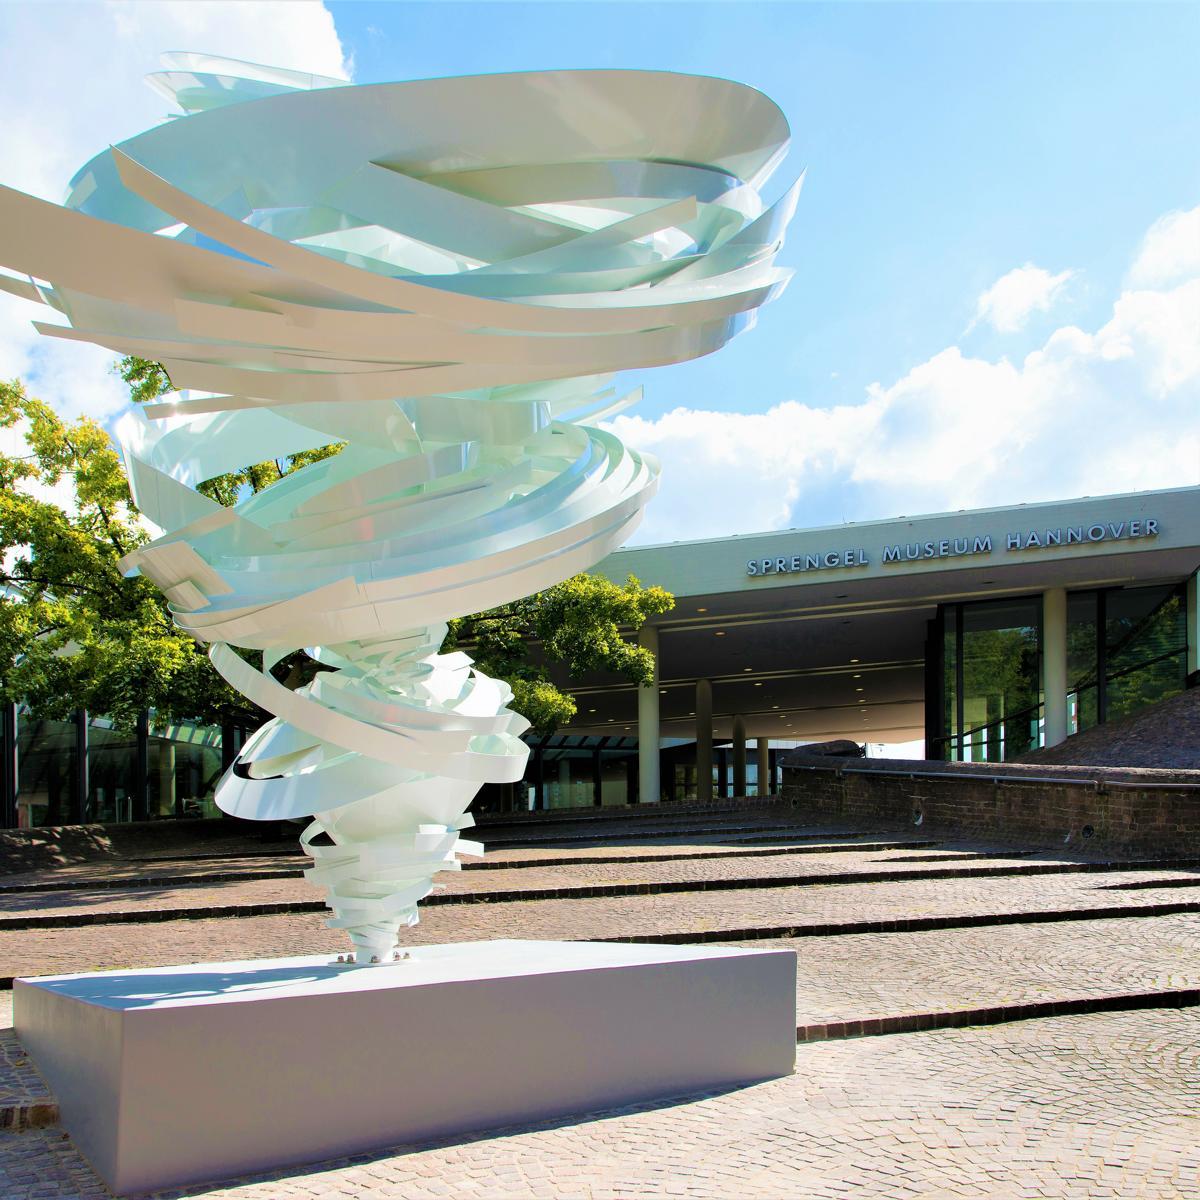 Style Hannover Sprengel Museum B - Sprengel Museum Hannover